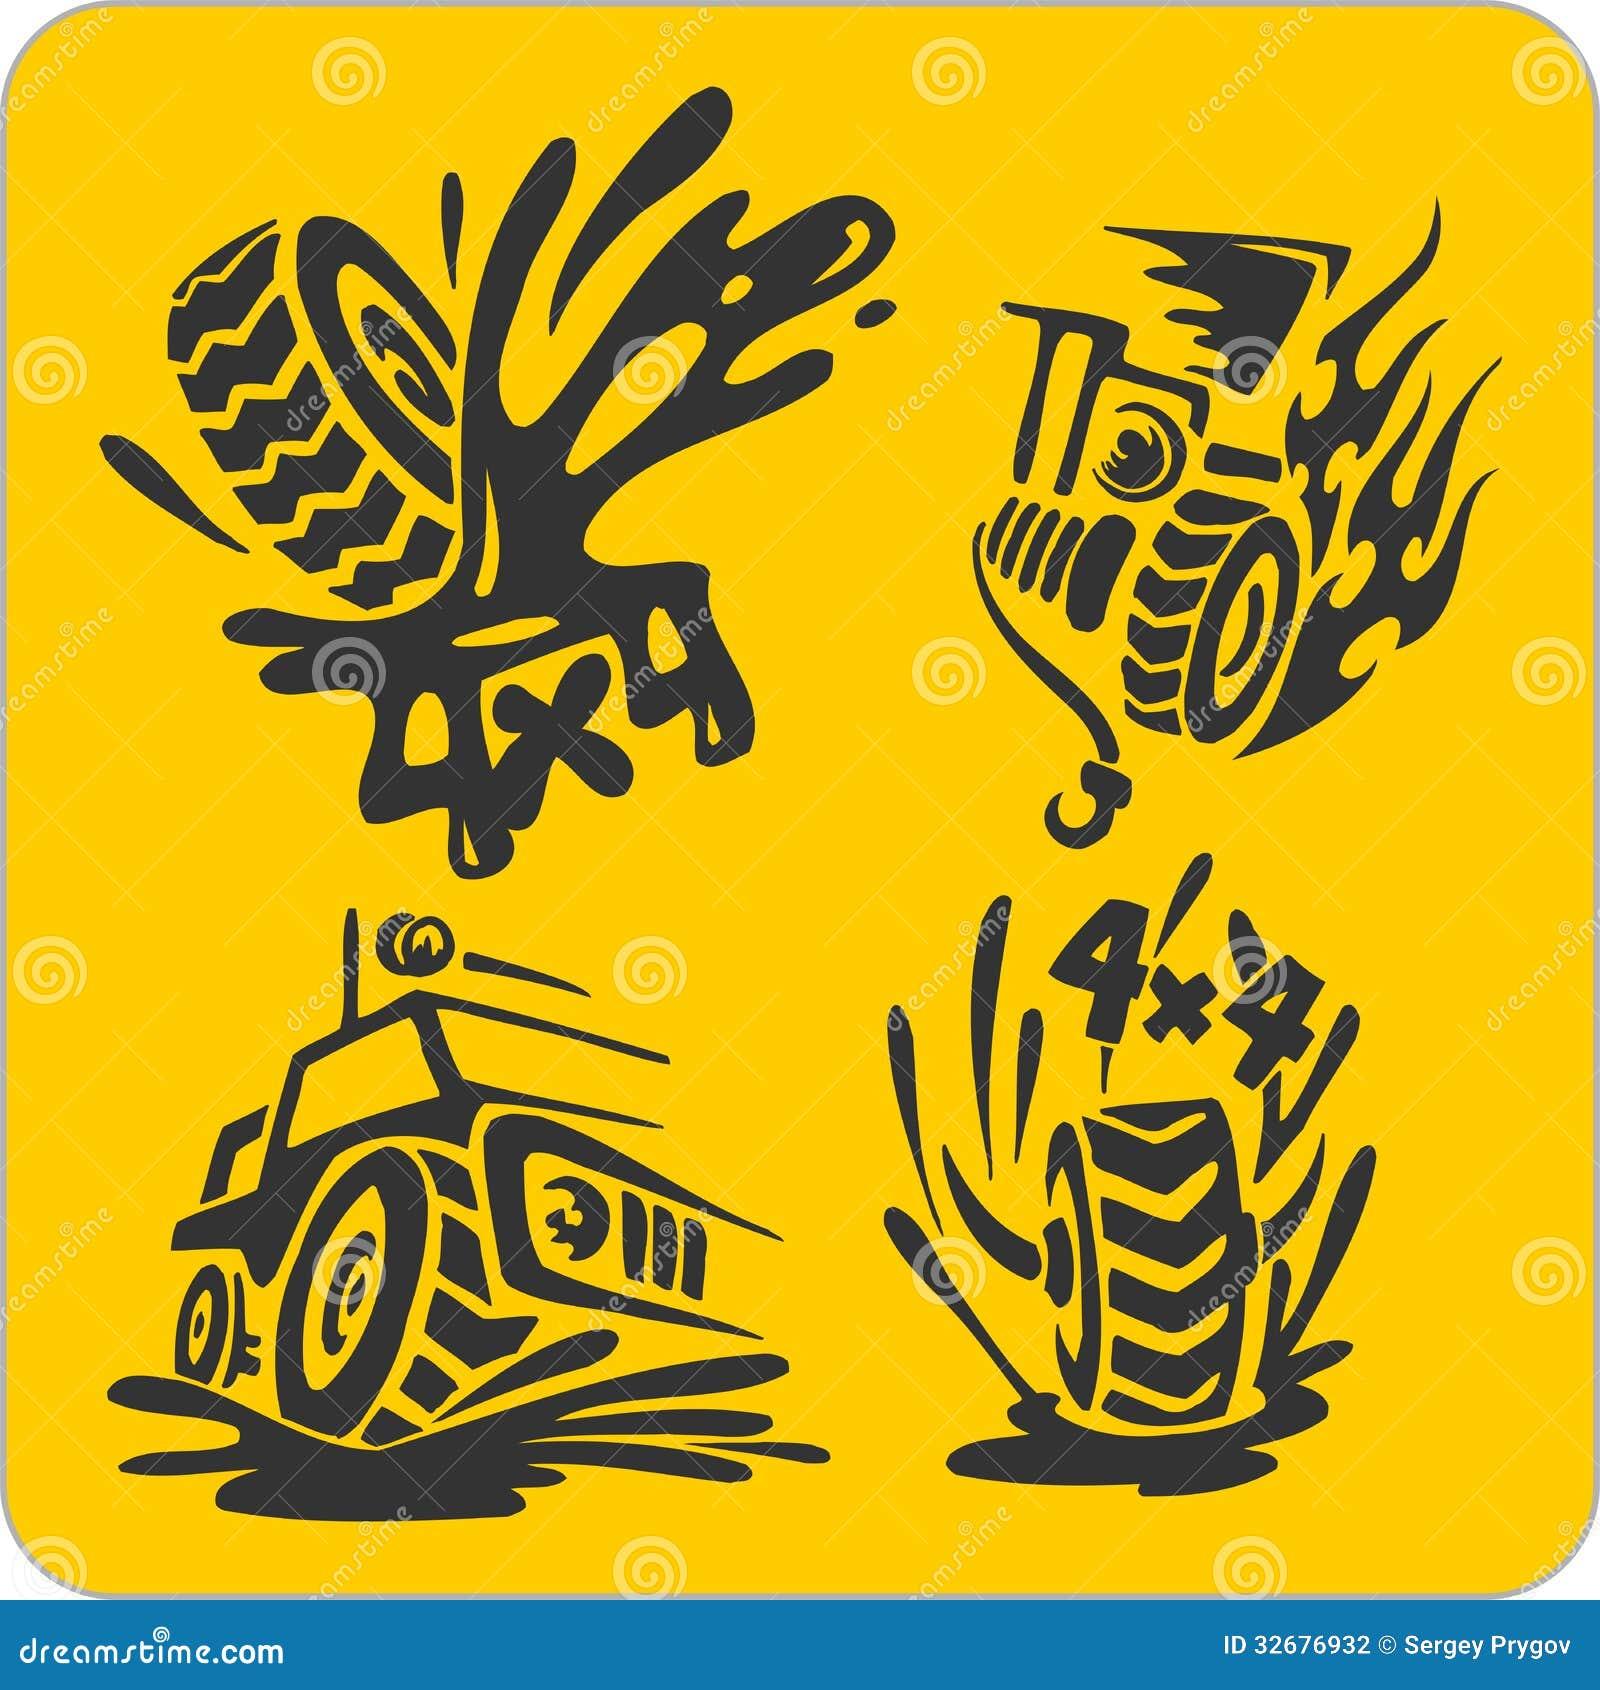 International on off symbols gallery symbol and sign ideas off road symbols vector set stock vector illustration 32676932 off road symbols vector set buycottarizona biocorpaavc